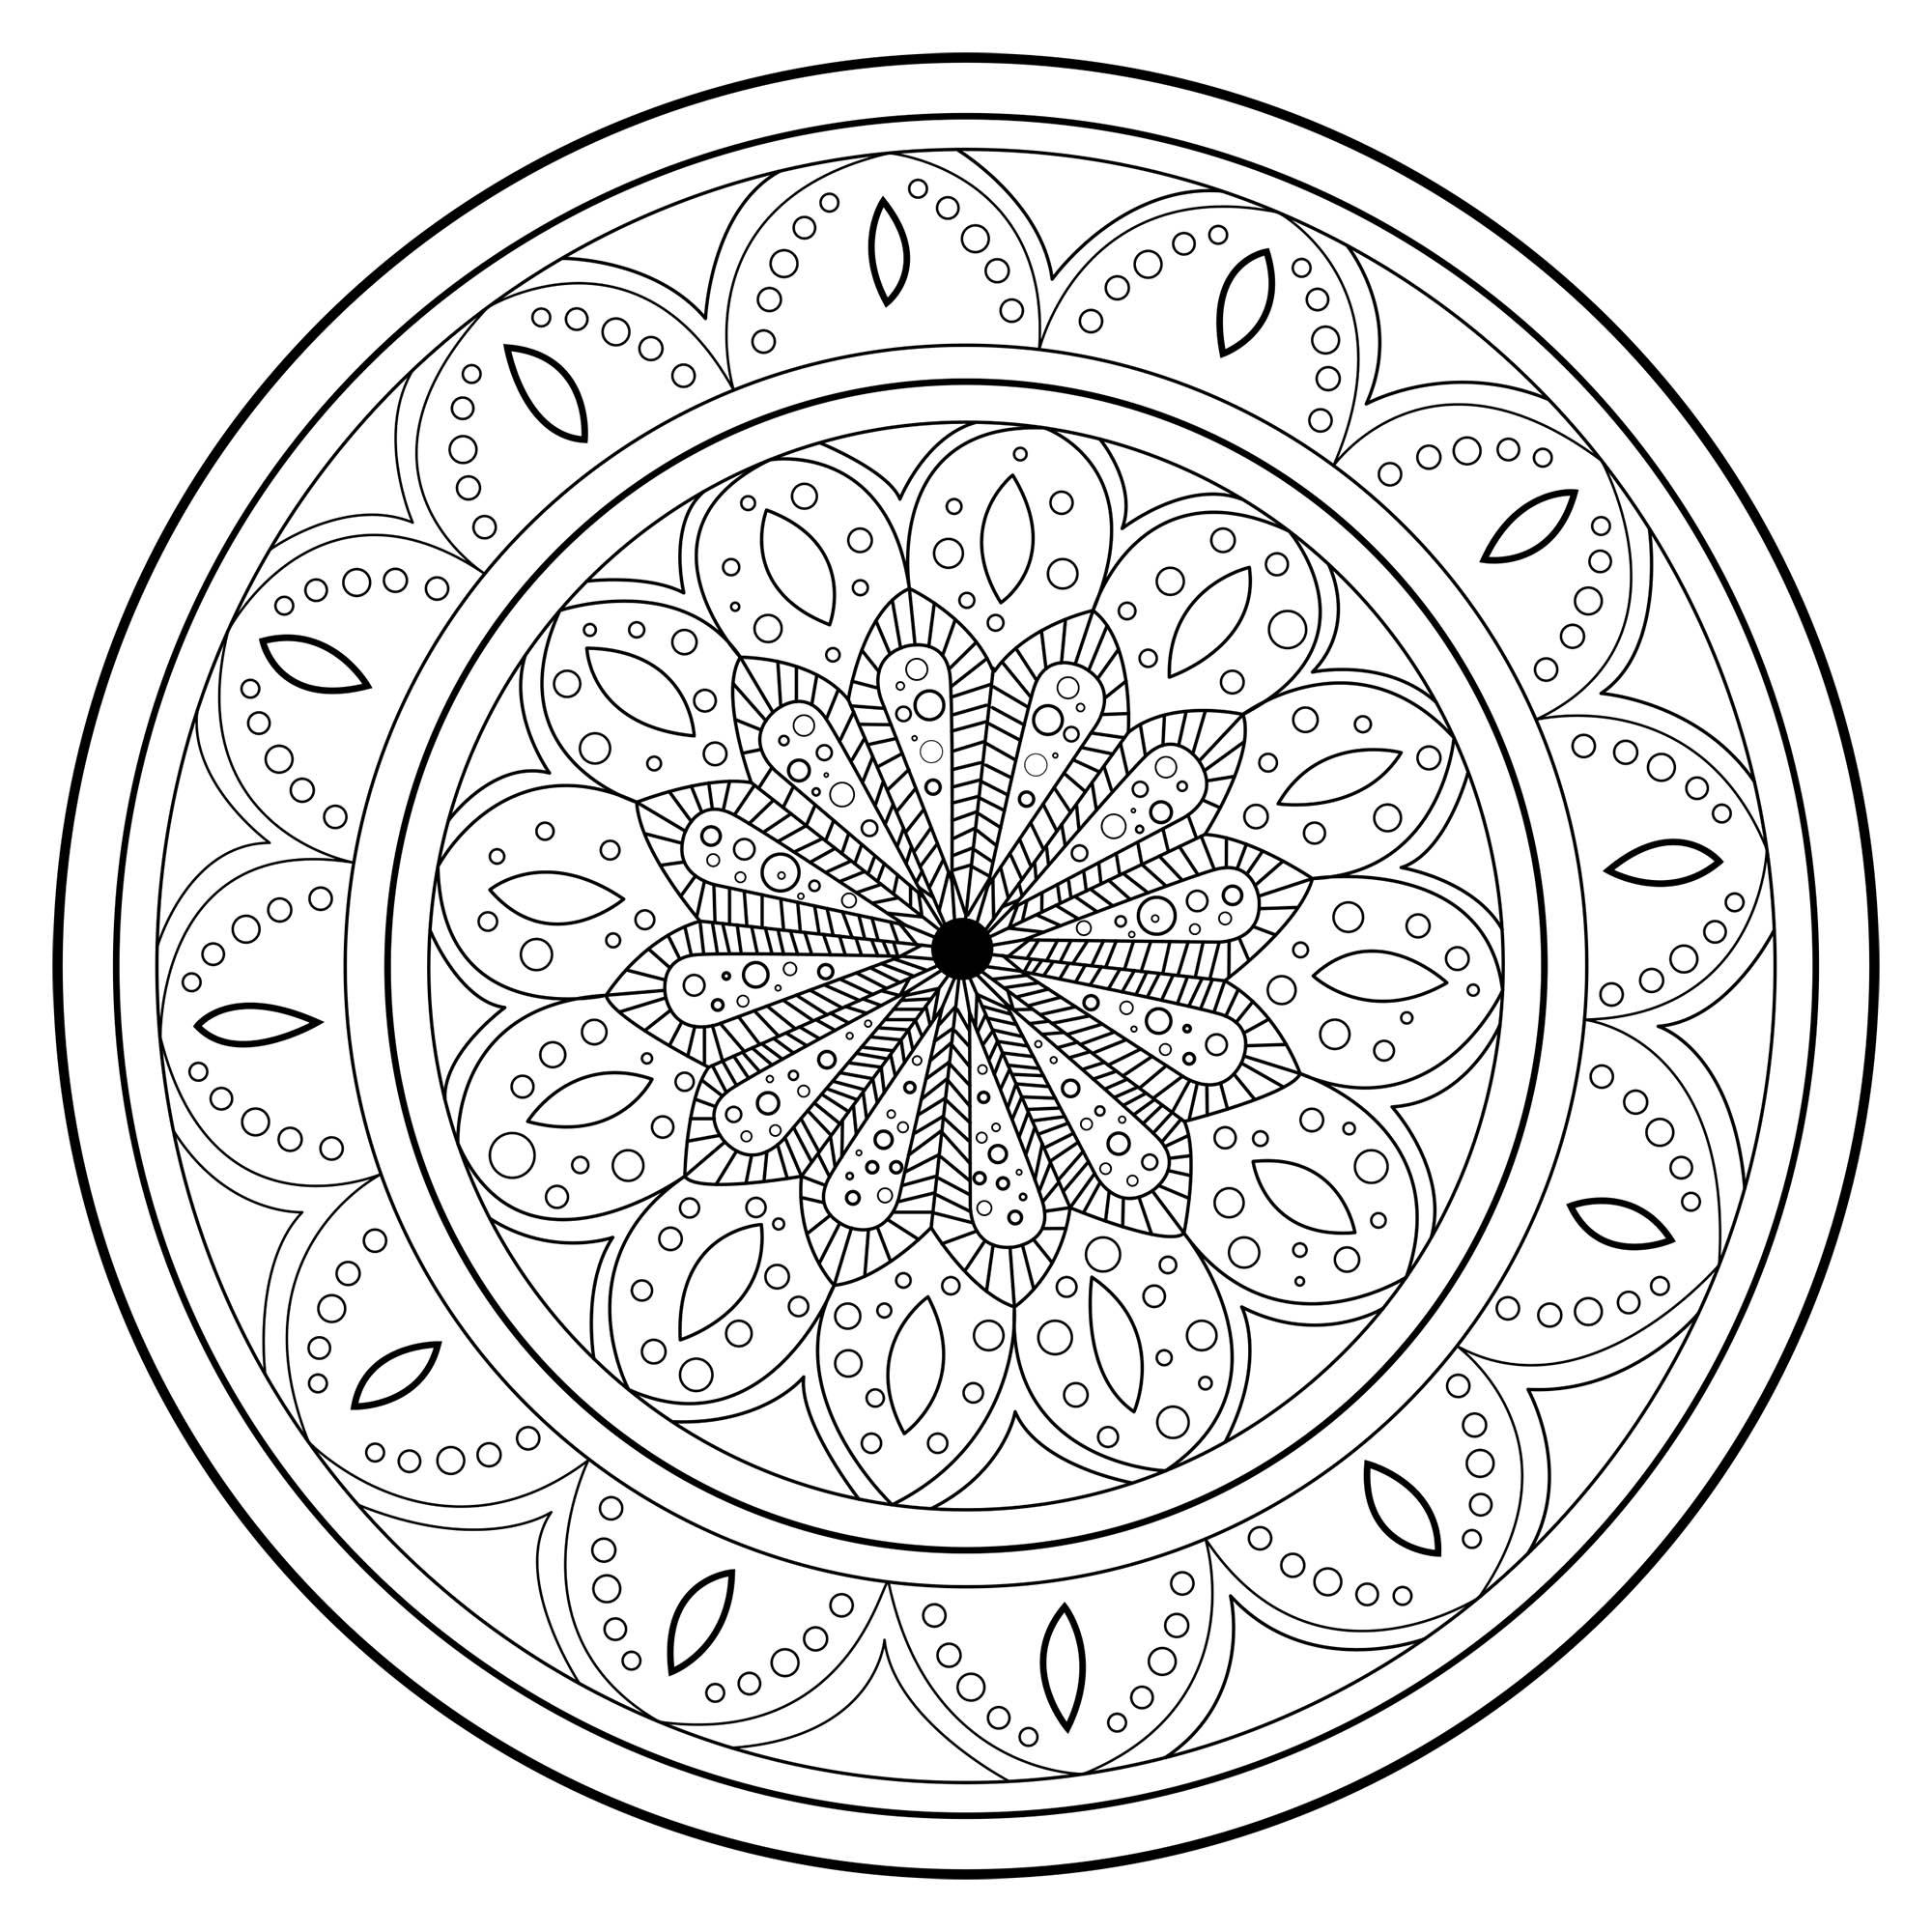 Zen & Anti-stress Mandala - 2